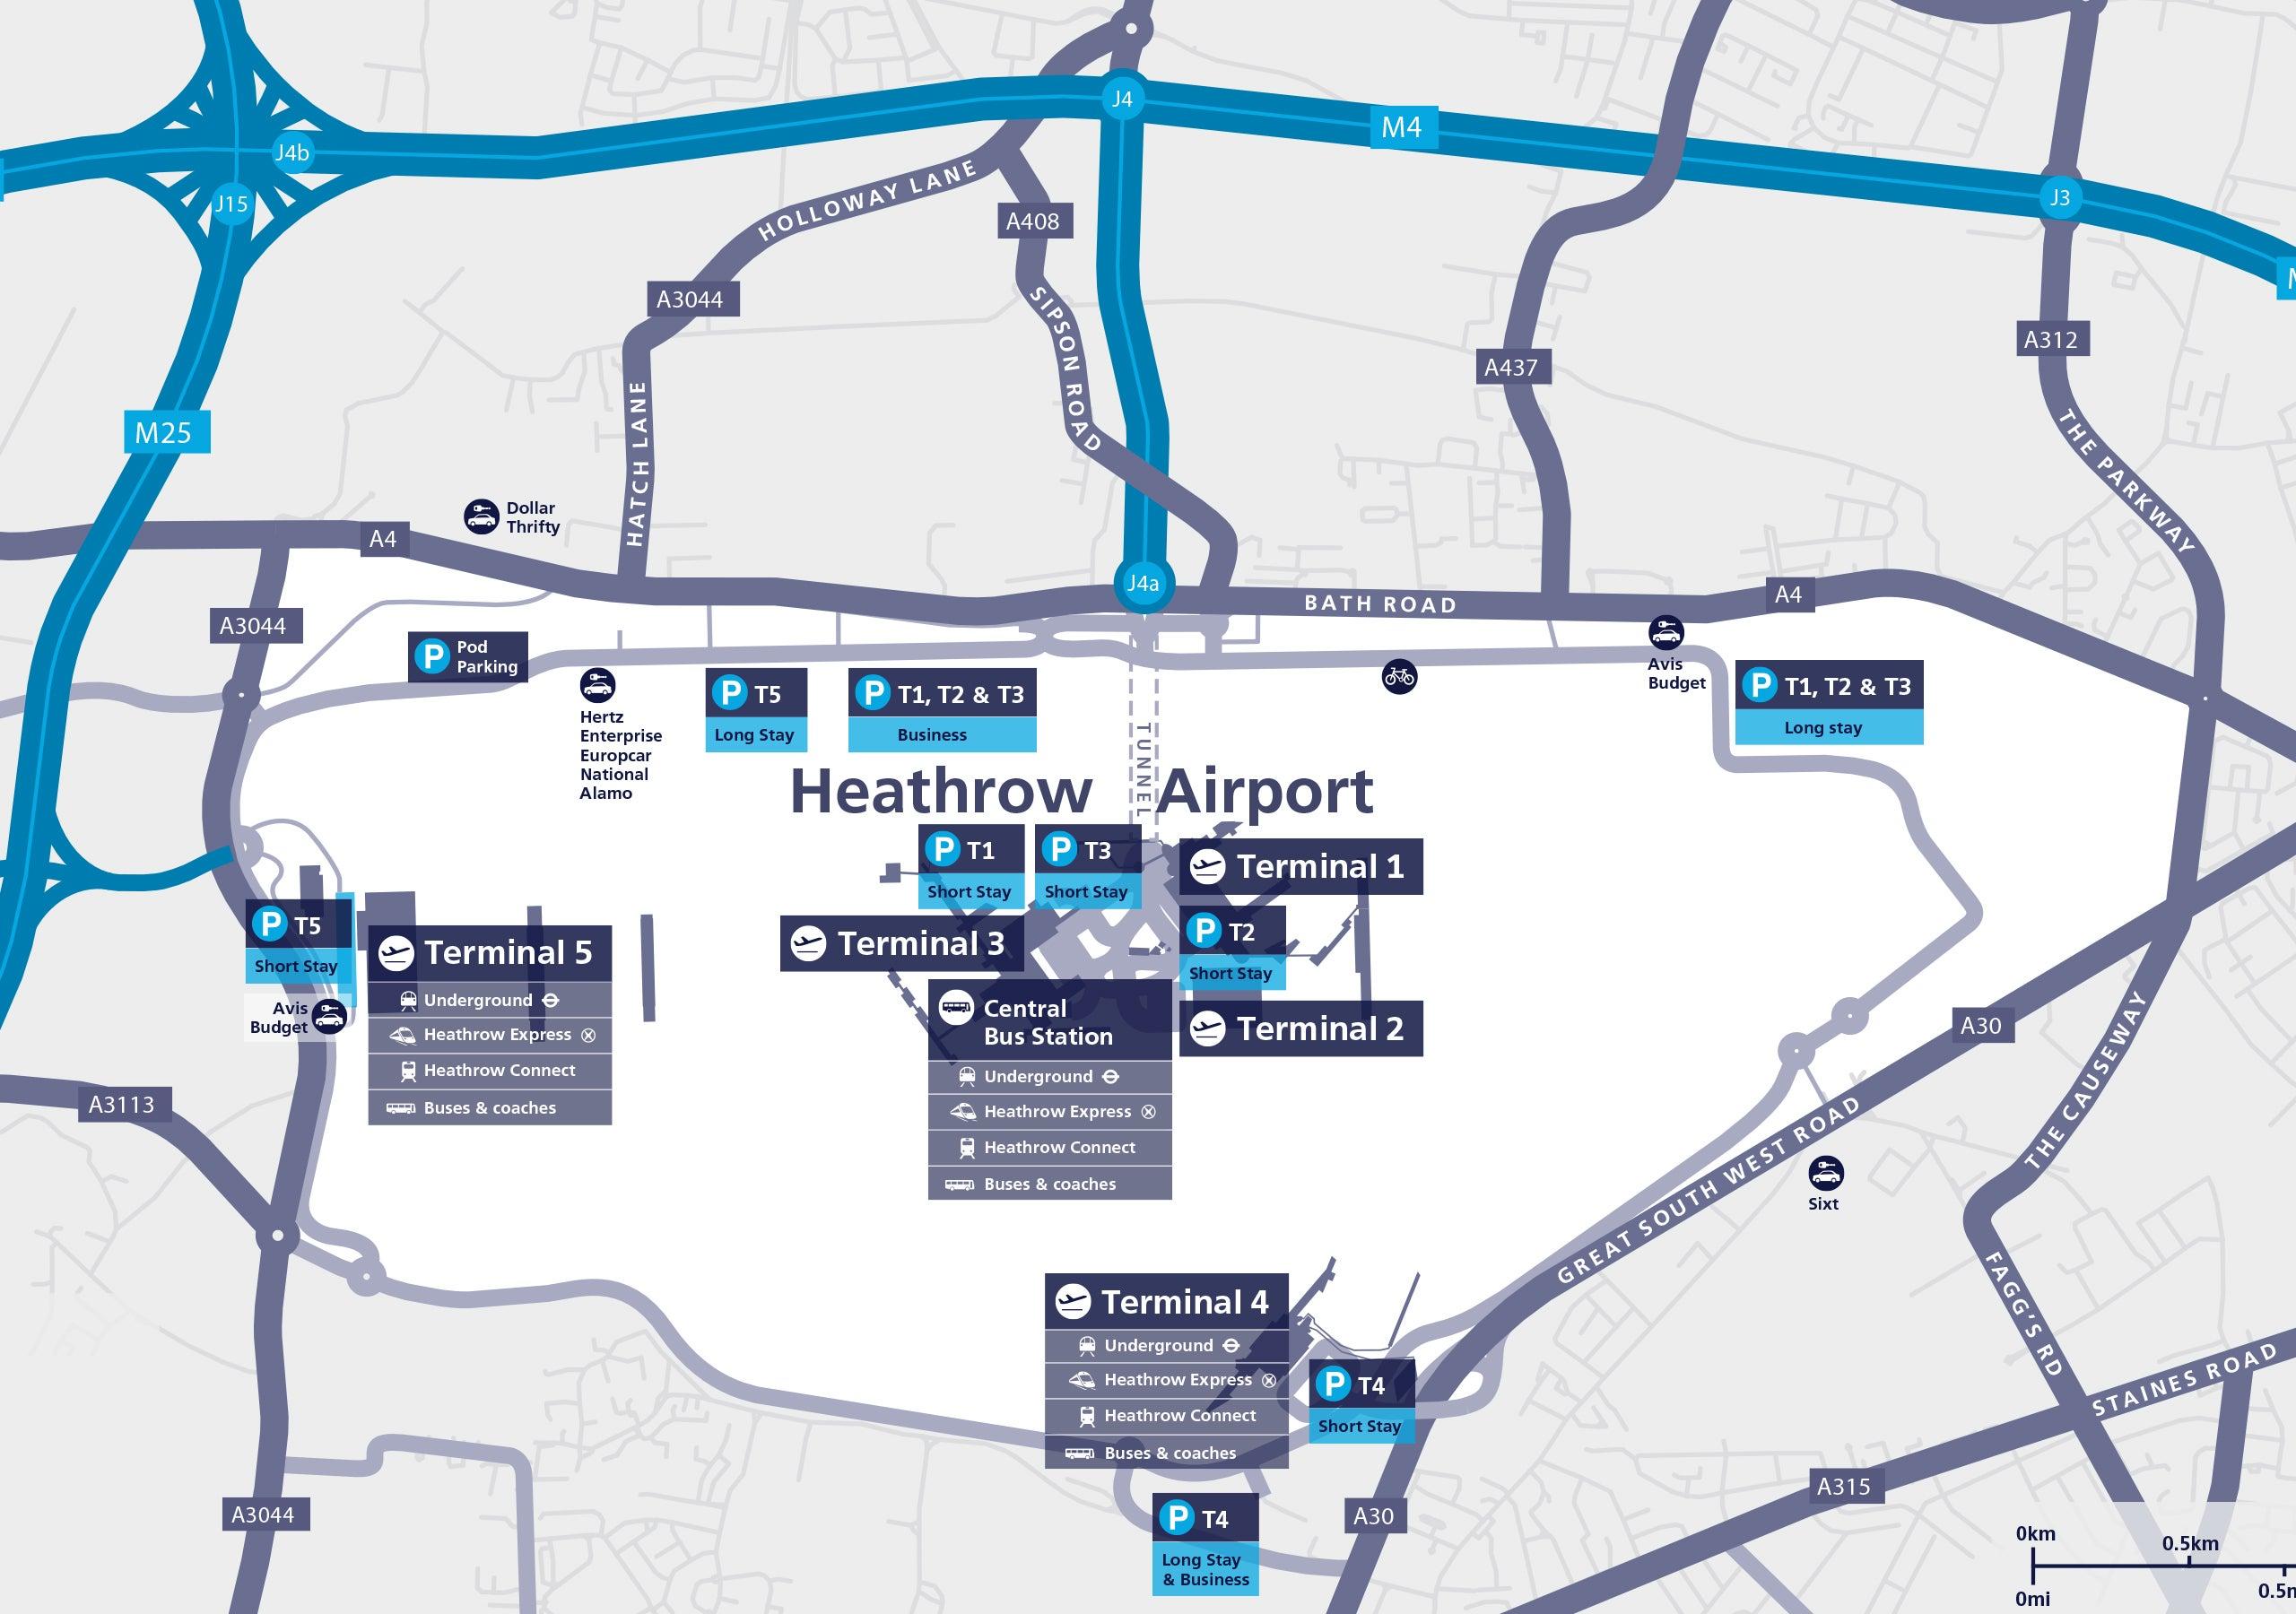 Heathrow Airport Terminal 2 - Aer Lingus